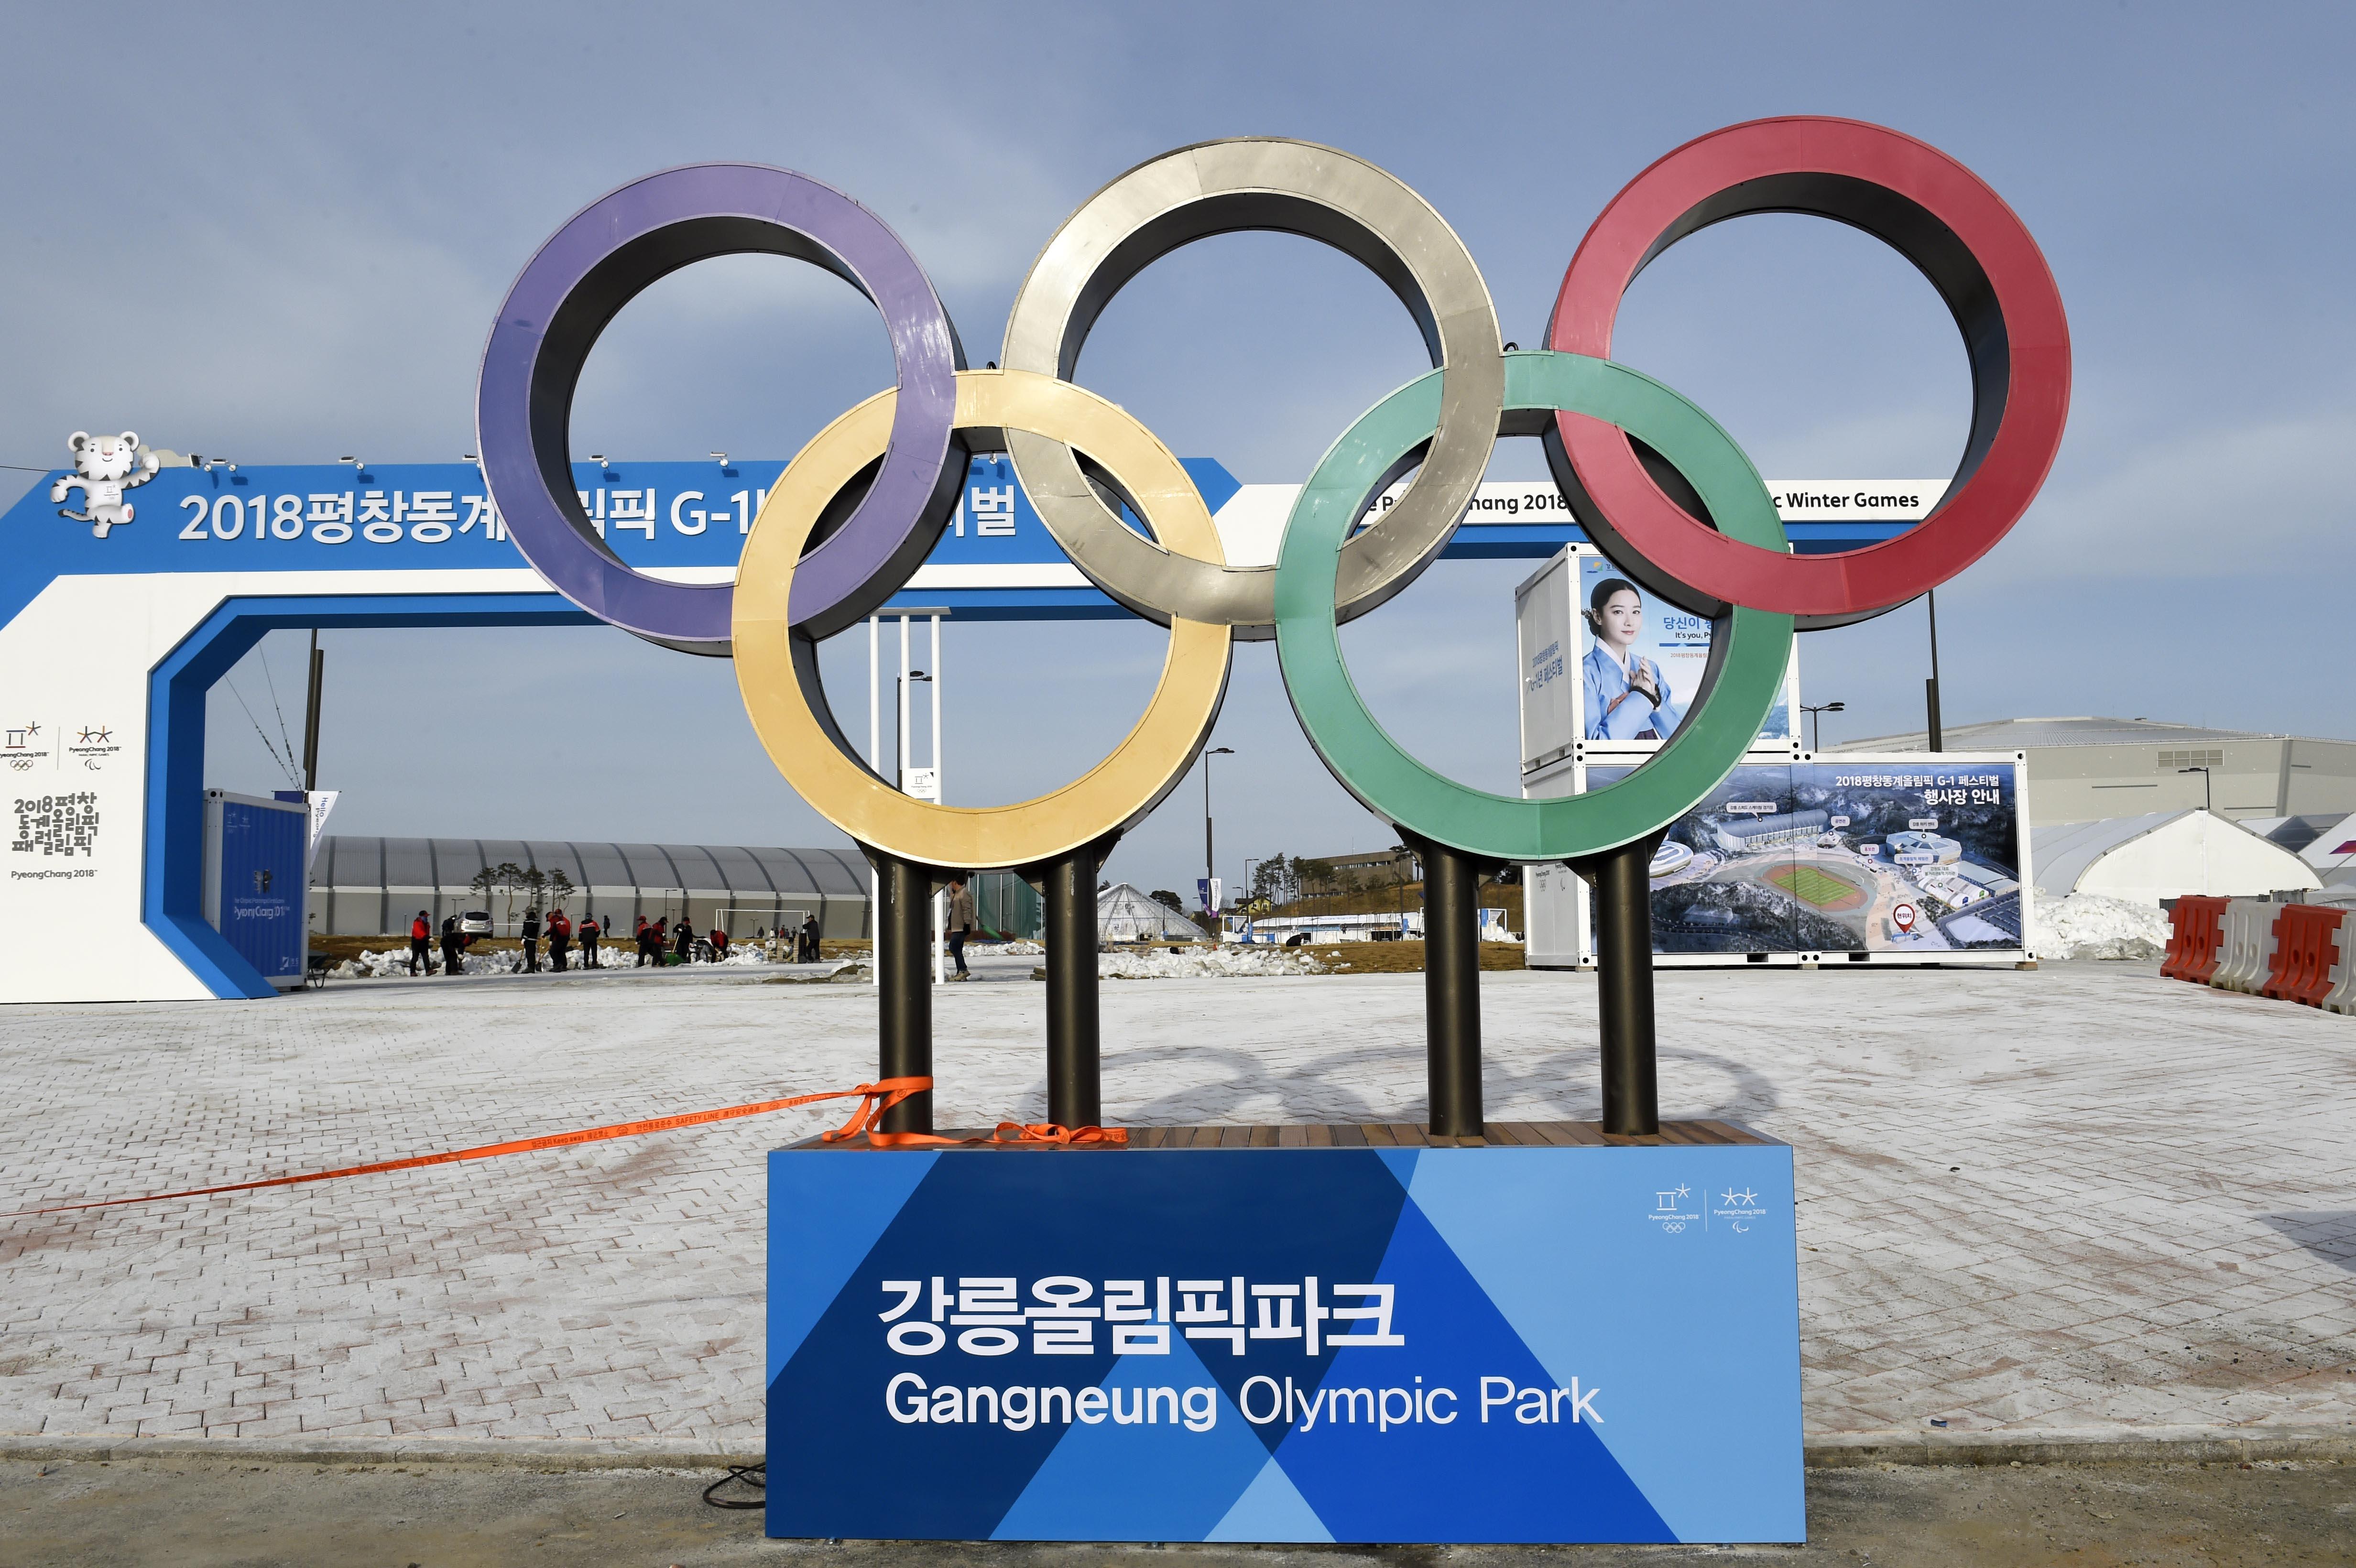 Gangneung Olympic Park